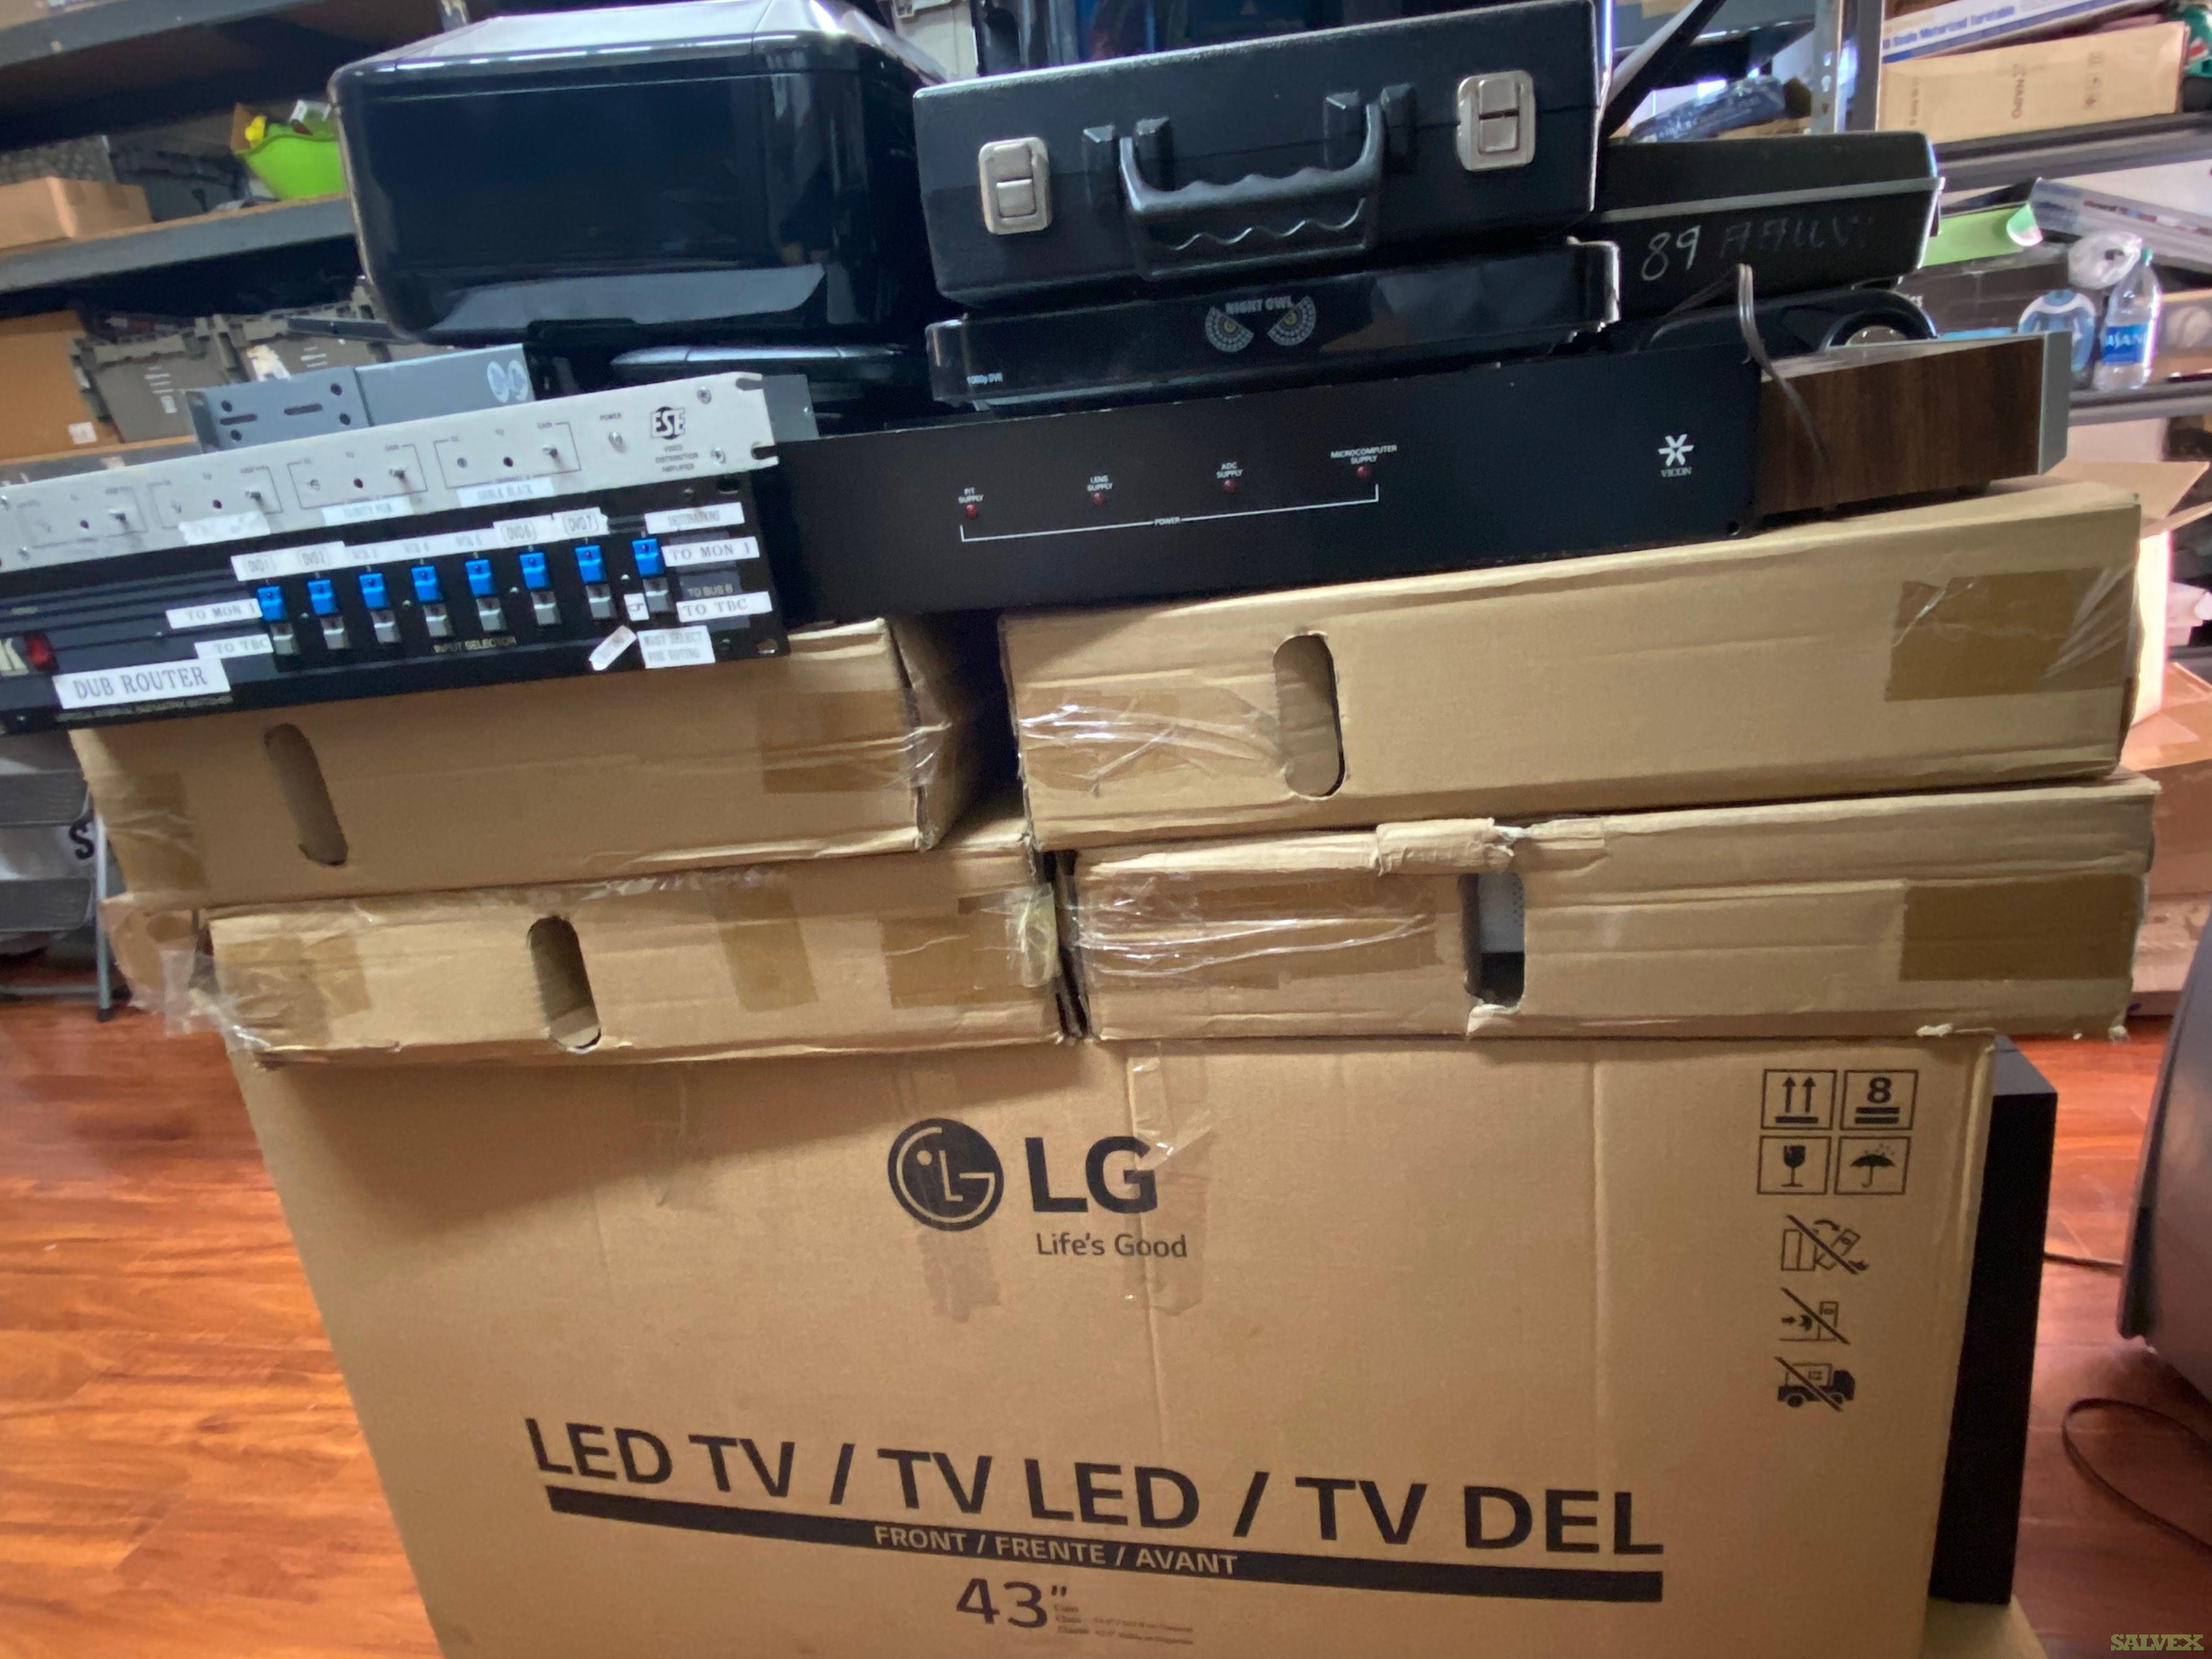 Electronics, Laptops, Printers, Monitors,  Studio TV Equipment (41 Units) in Los Angeles, California